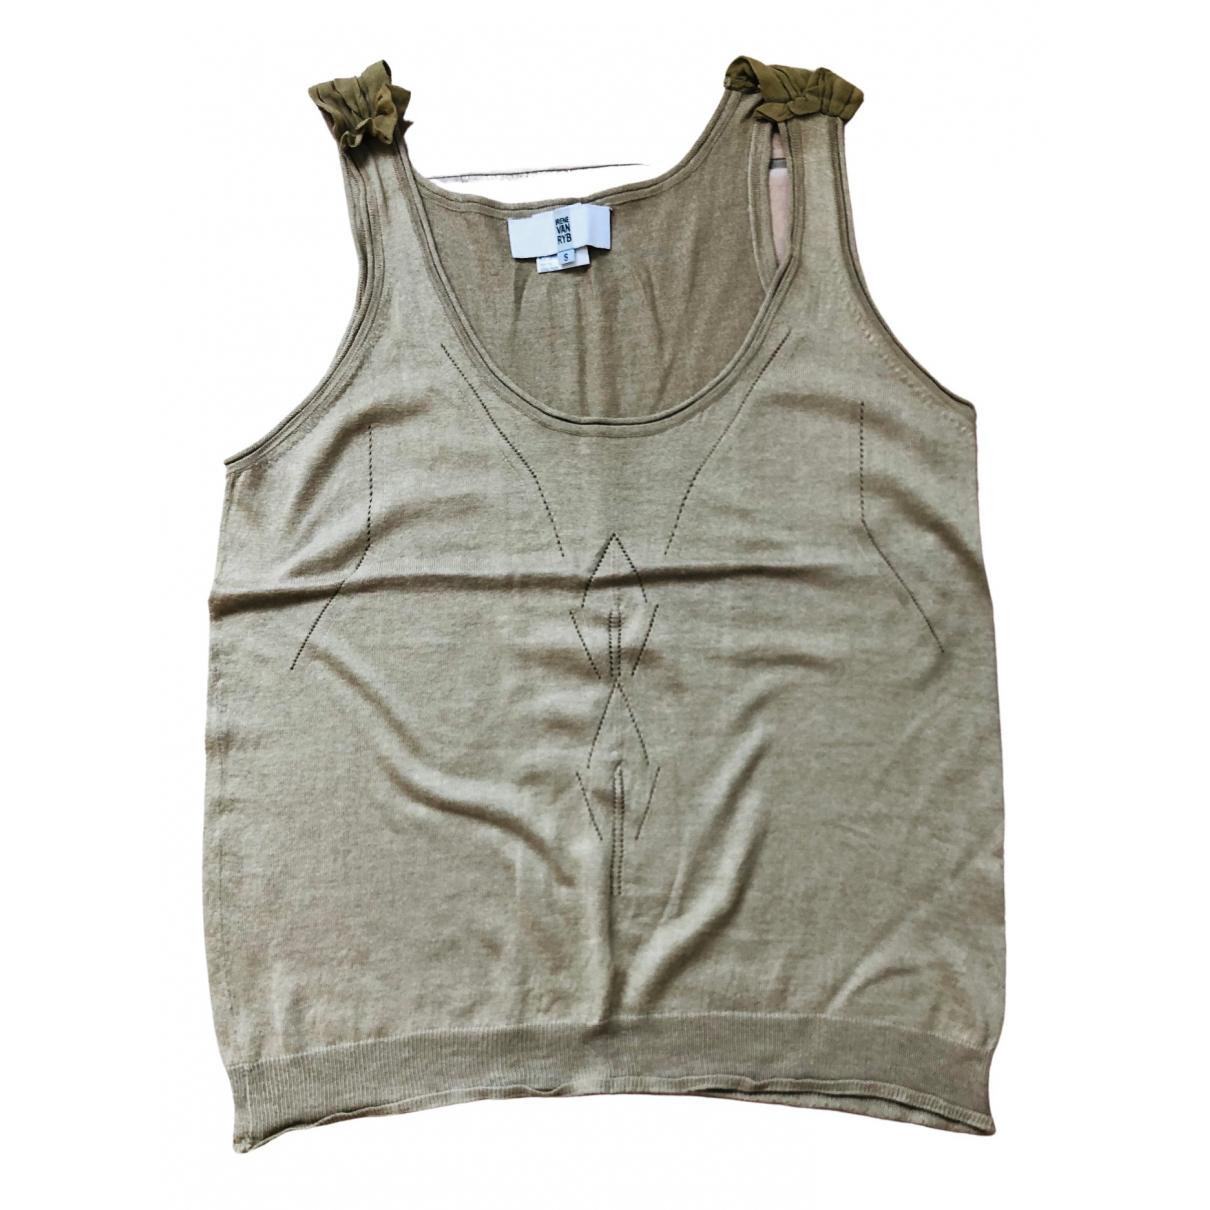 Camiseta sin mangas Irene Van Ryb